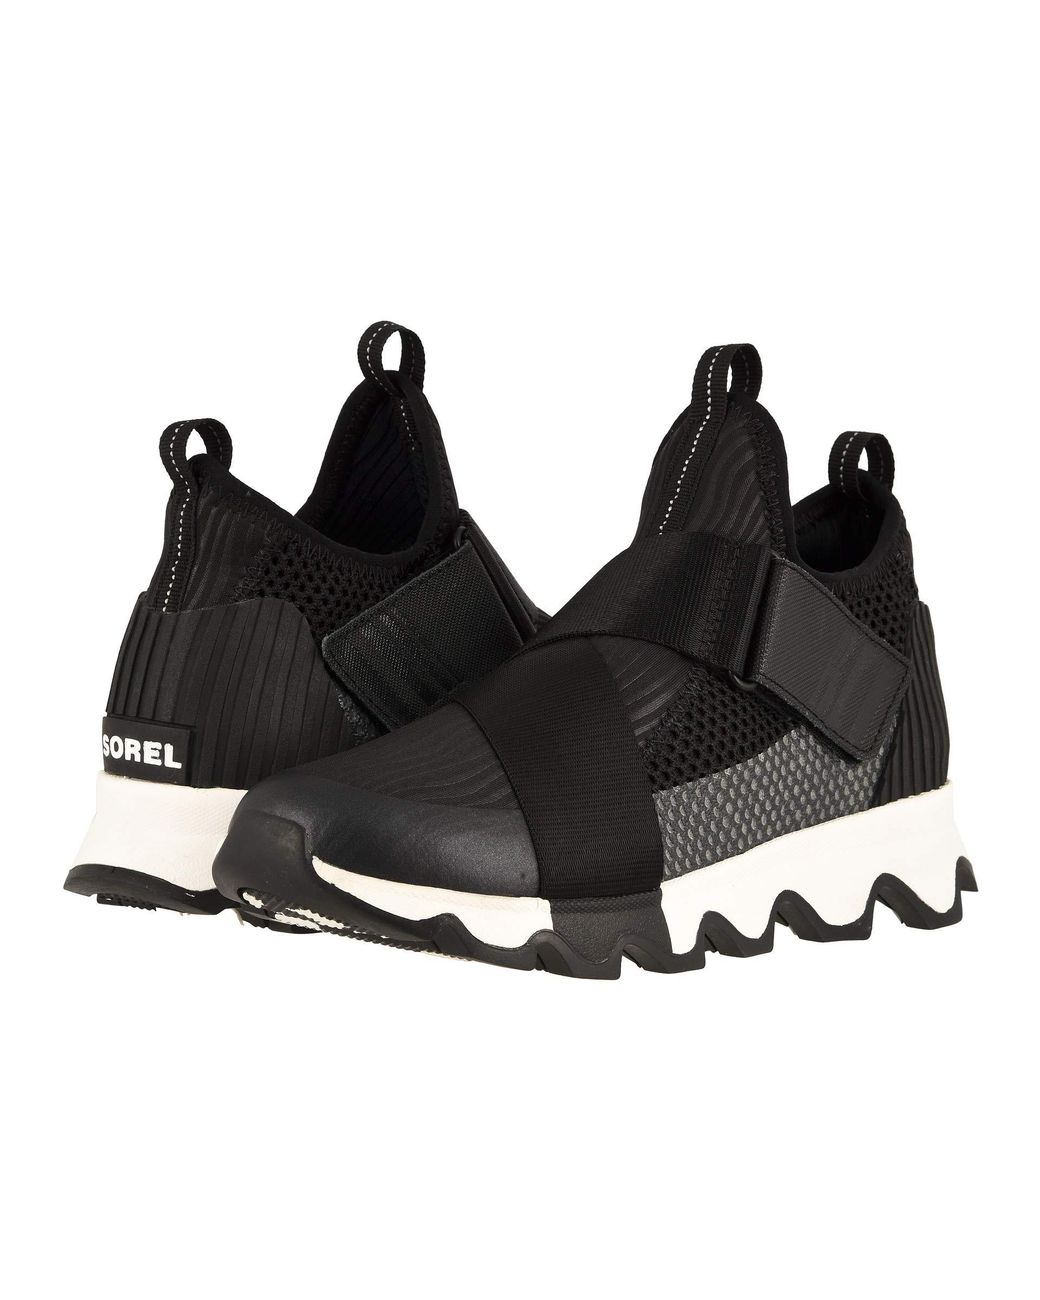 224e3a5935b Lyst - Sorel Kinetic Sneakers in Black - Save 44%